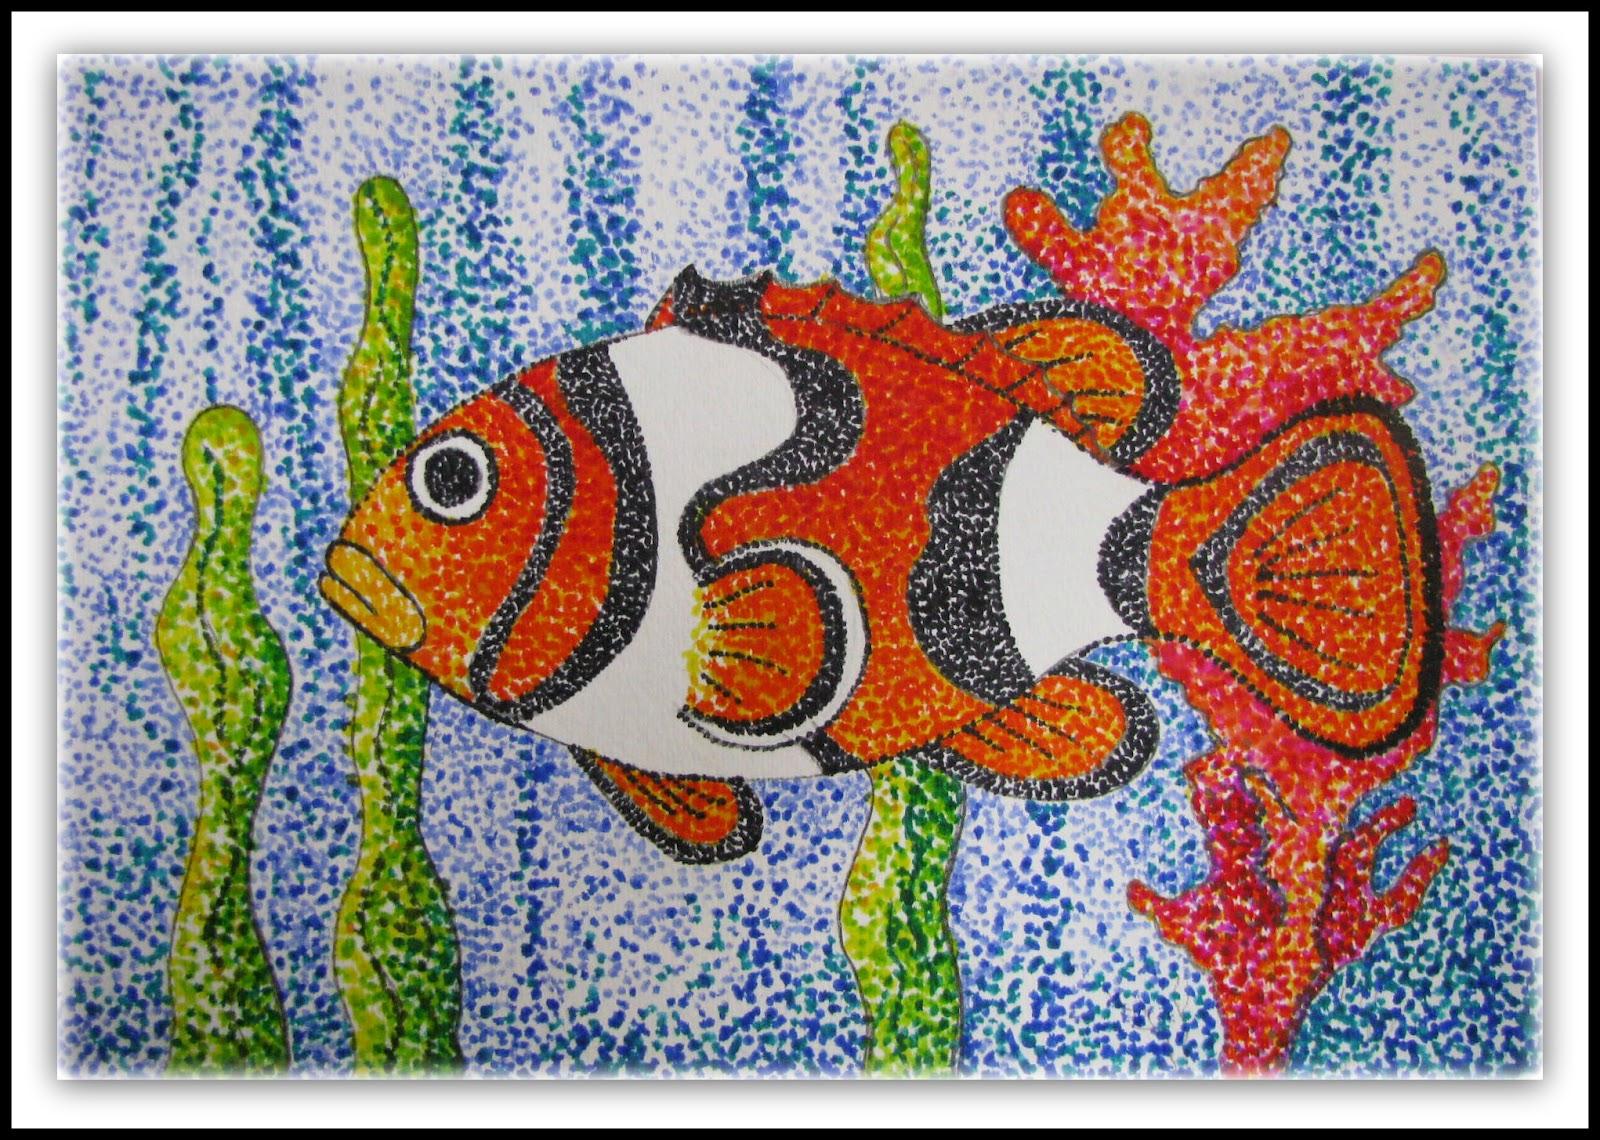 Plateau art studio june 2012 for Easy fish painting